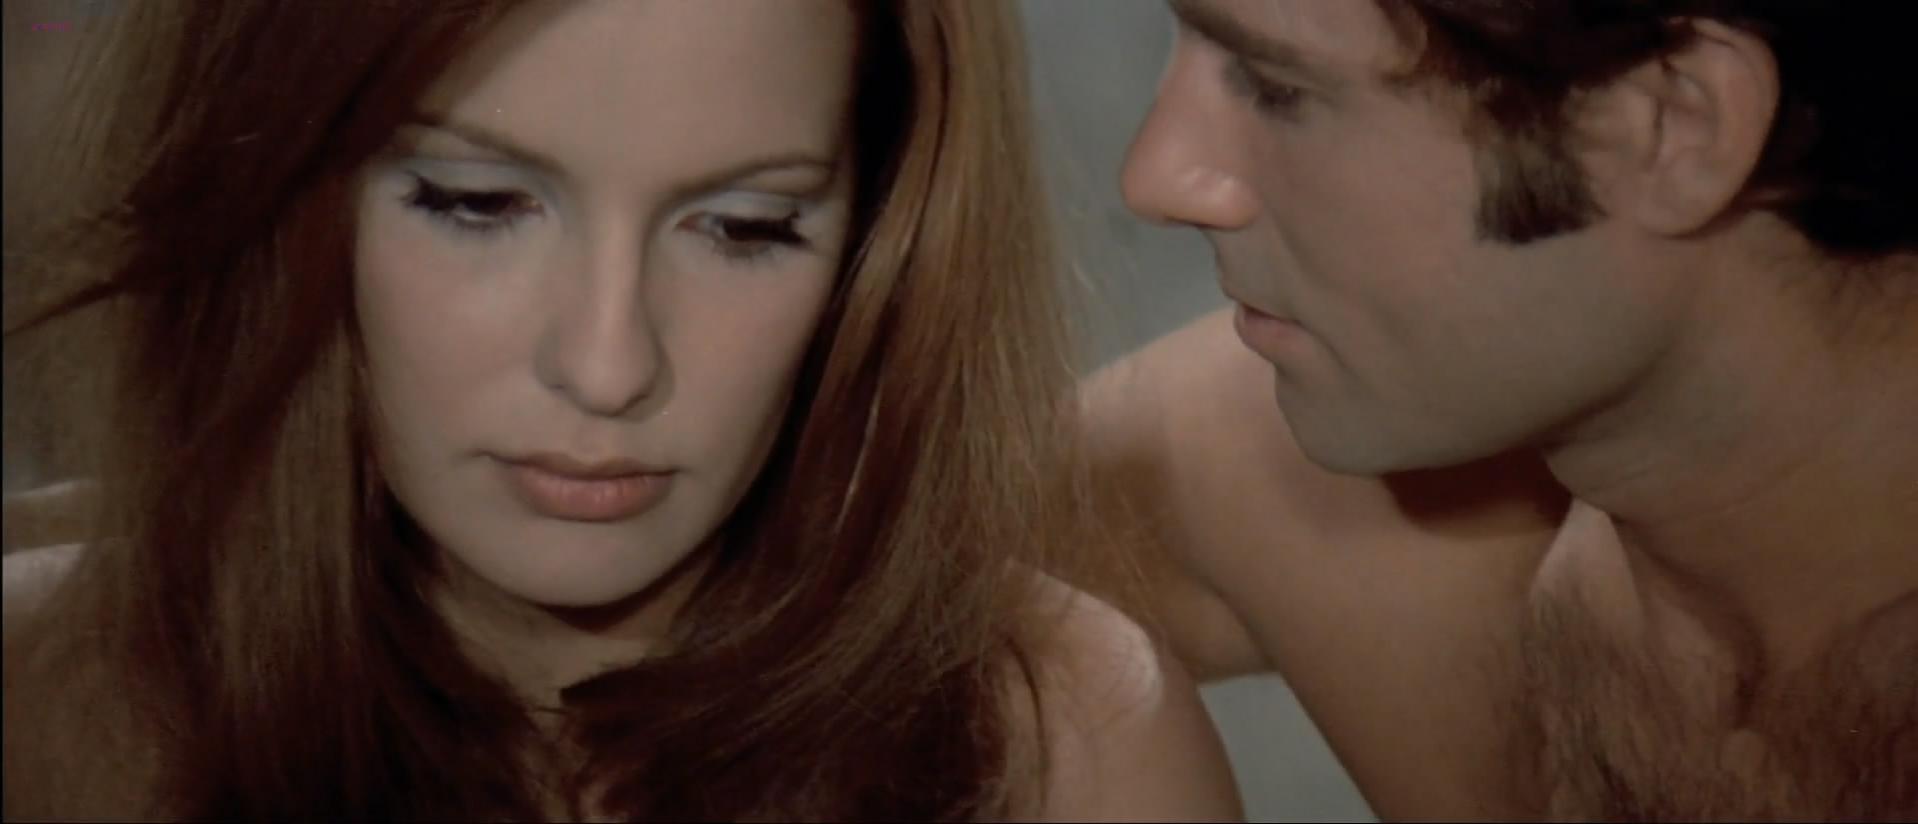 Daniele Gaubert nude - Camille 2000 (1969)